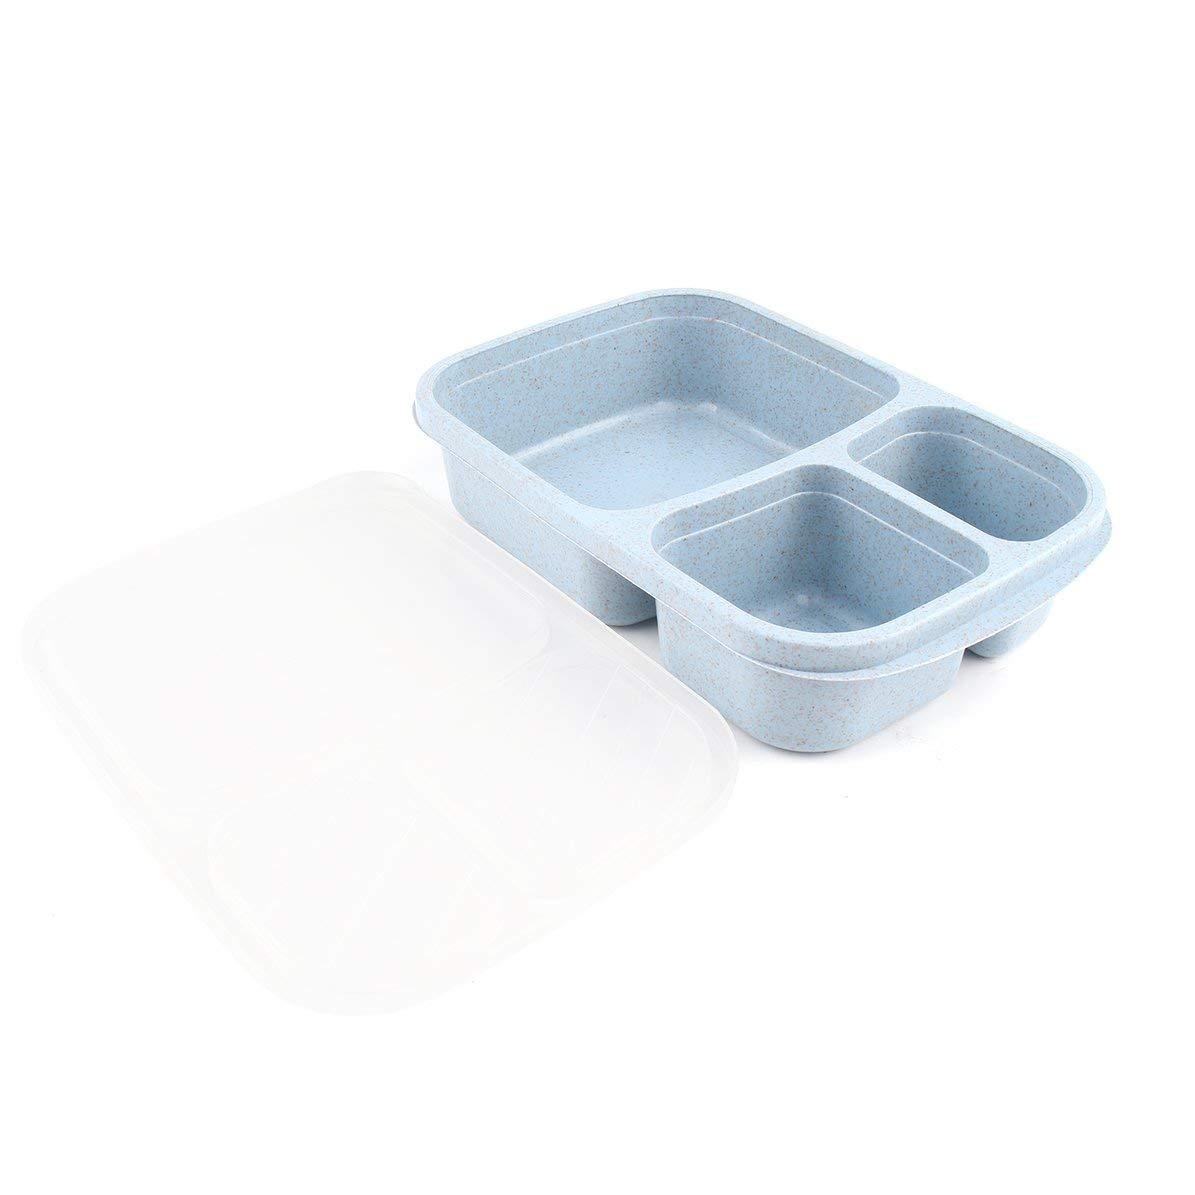 Caja de Bento de paja de trigo 3 rejillas con tapa Caja de comida de microondas Contenedor de almacenamiento biodegradable Almuerzo Caja de Bento Juego de vajilla azul WEIWEITOE